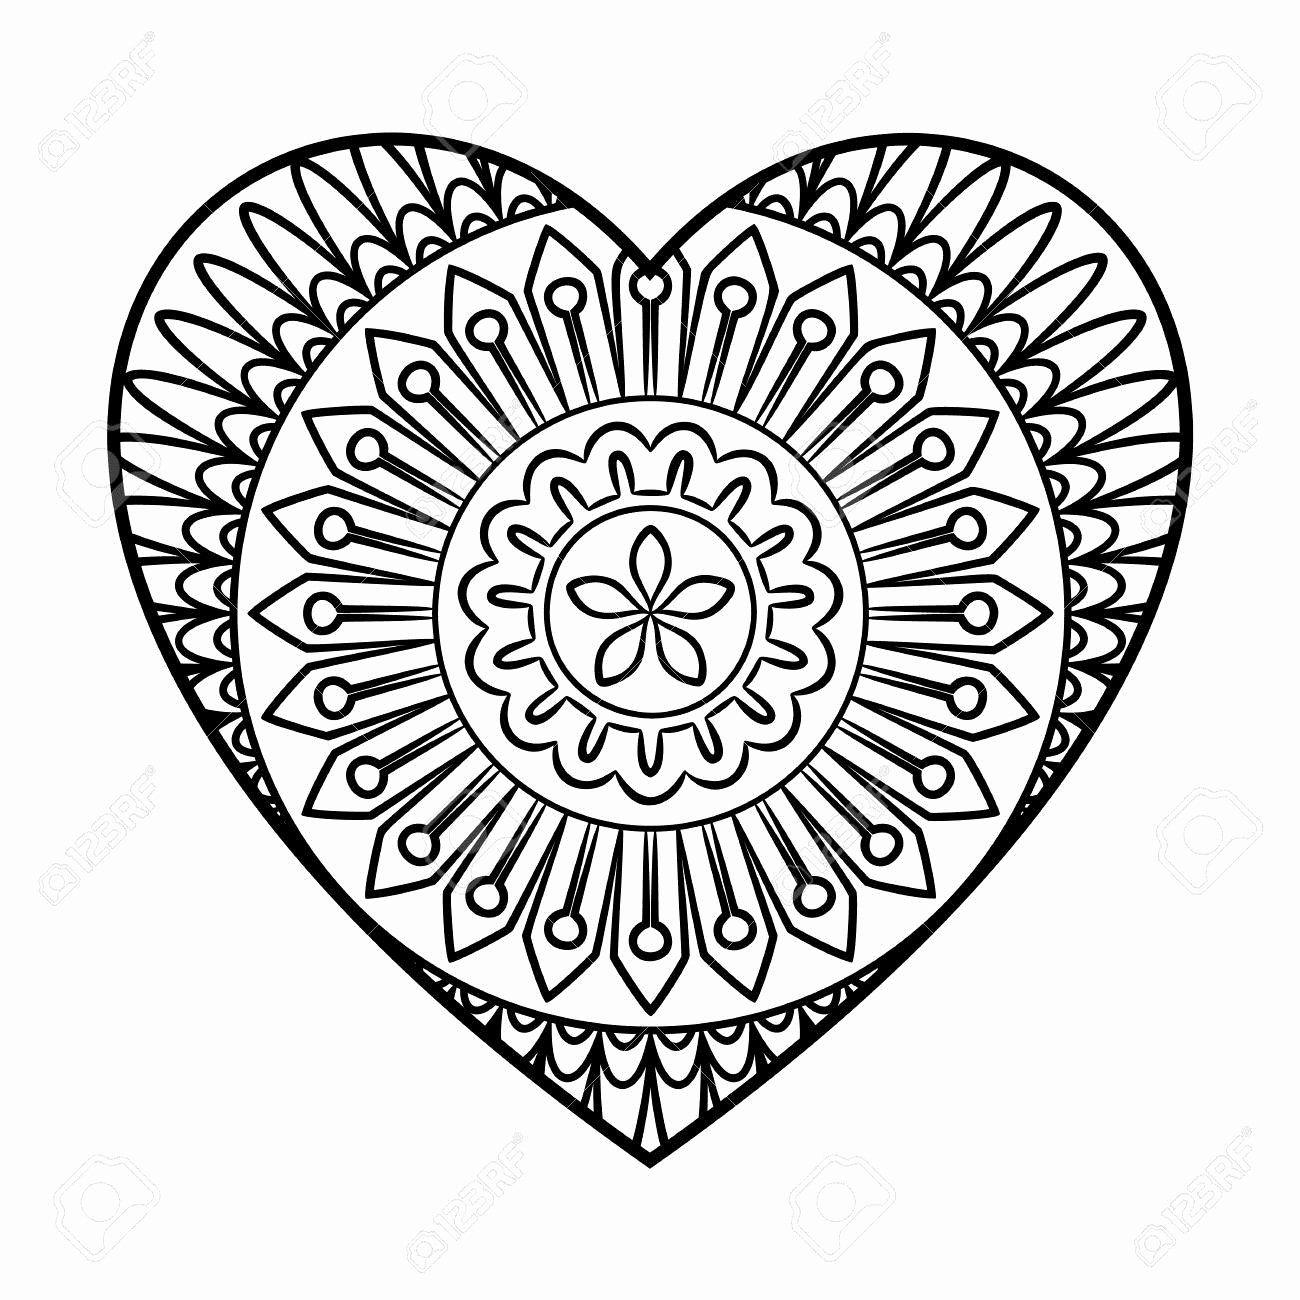 Coloring Pages Design Heart Inspirational Mandala Boyama Resimleri